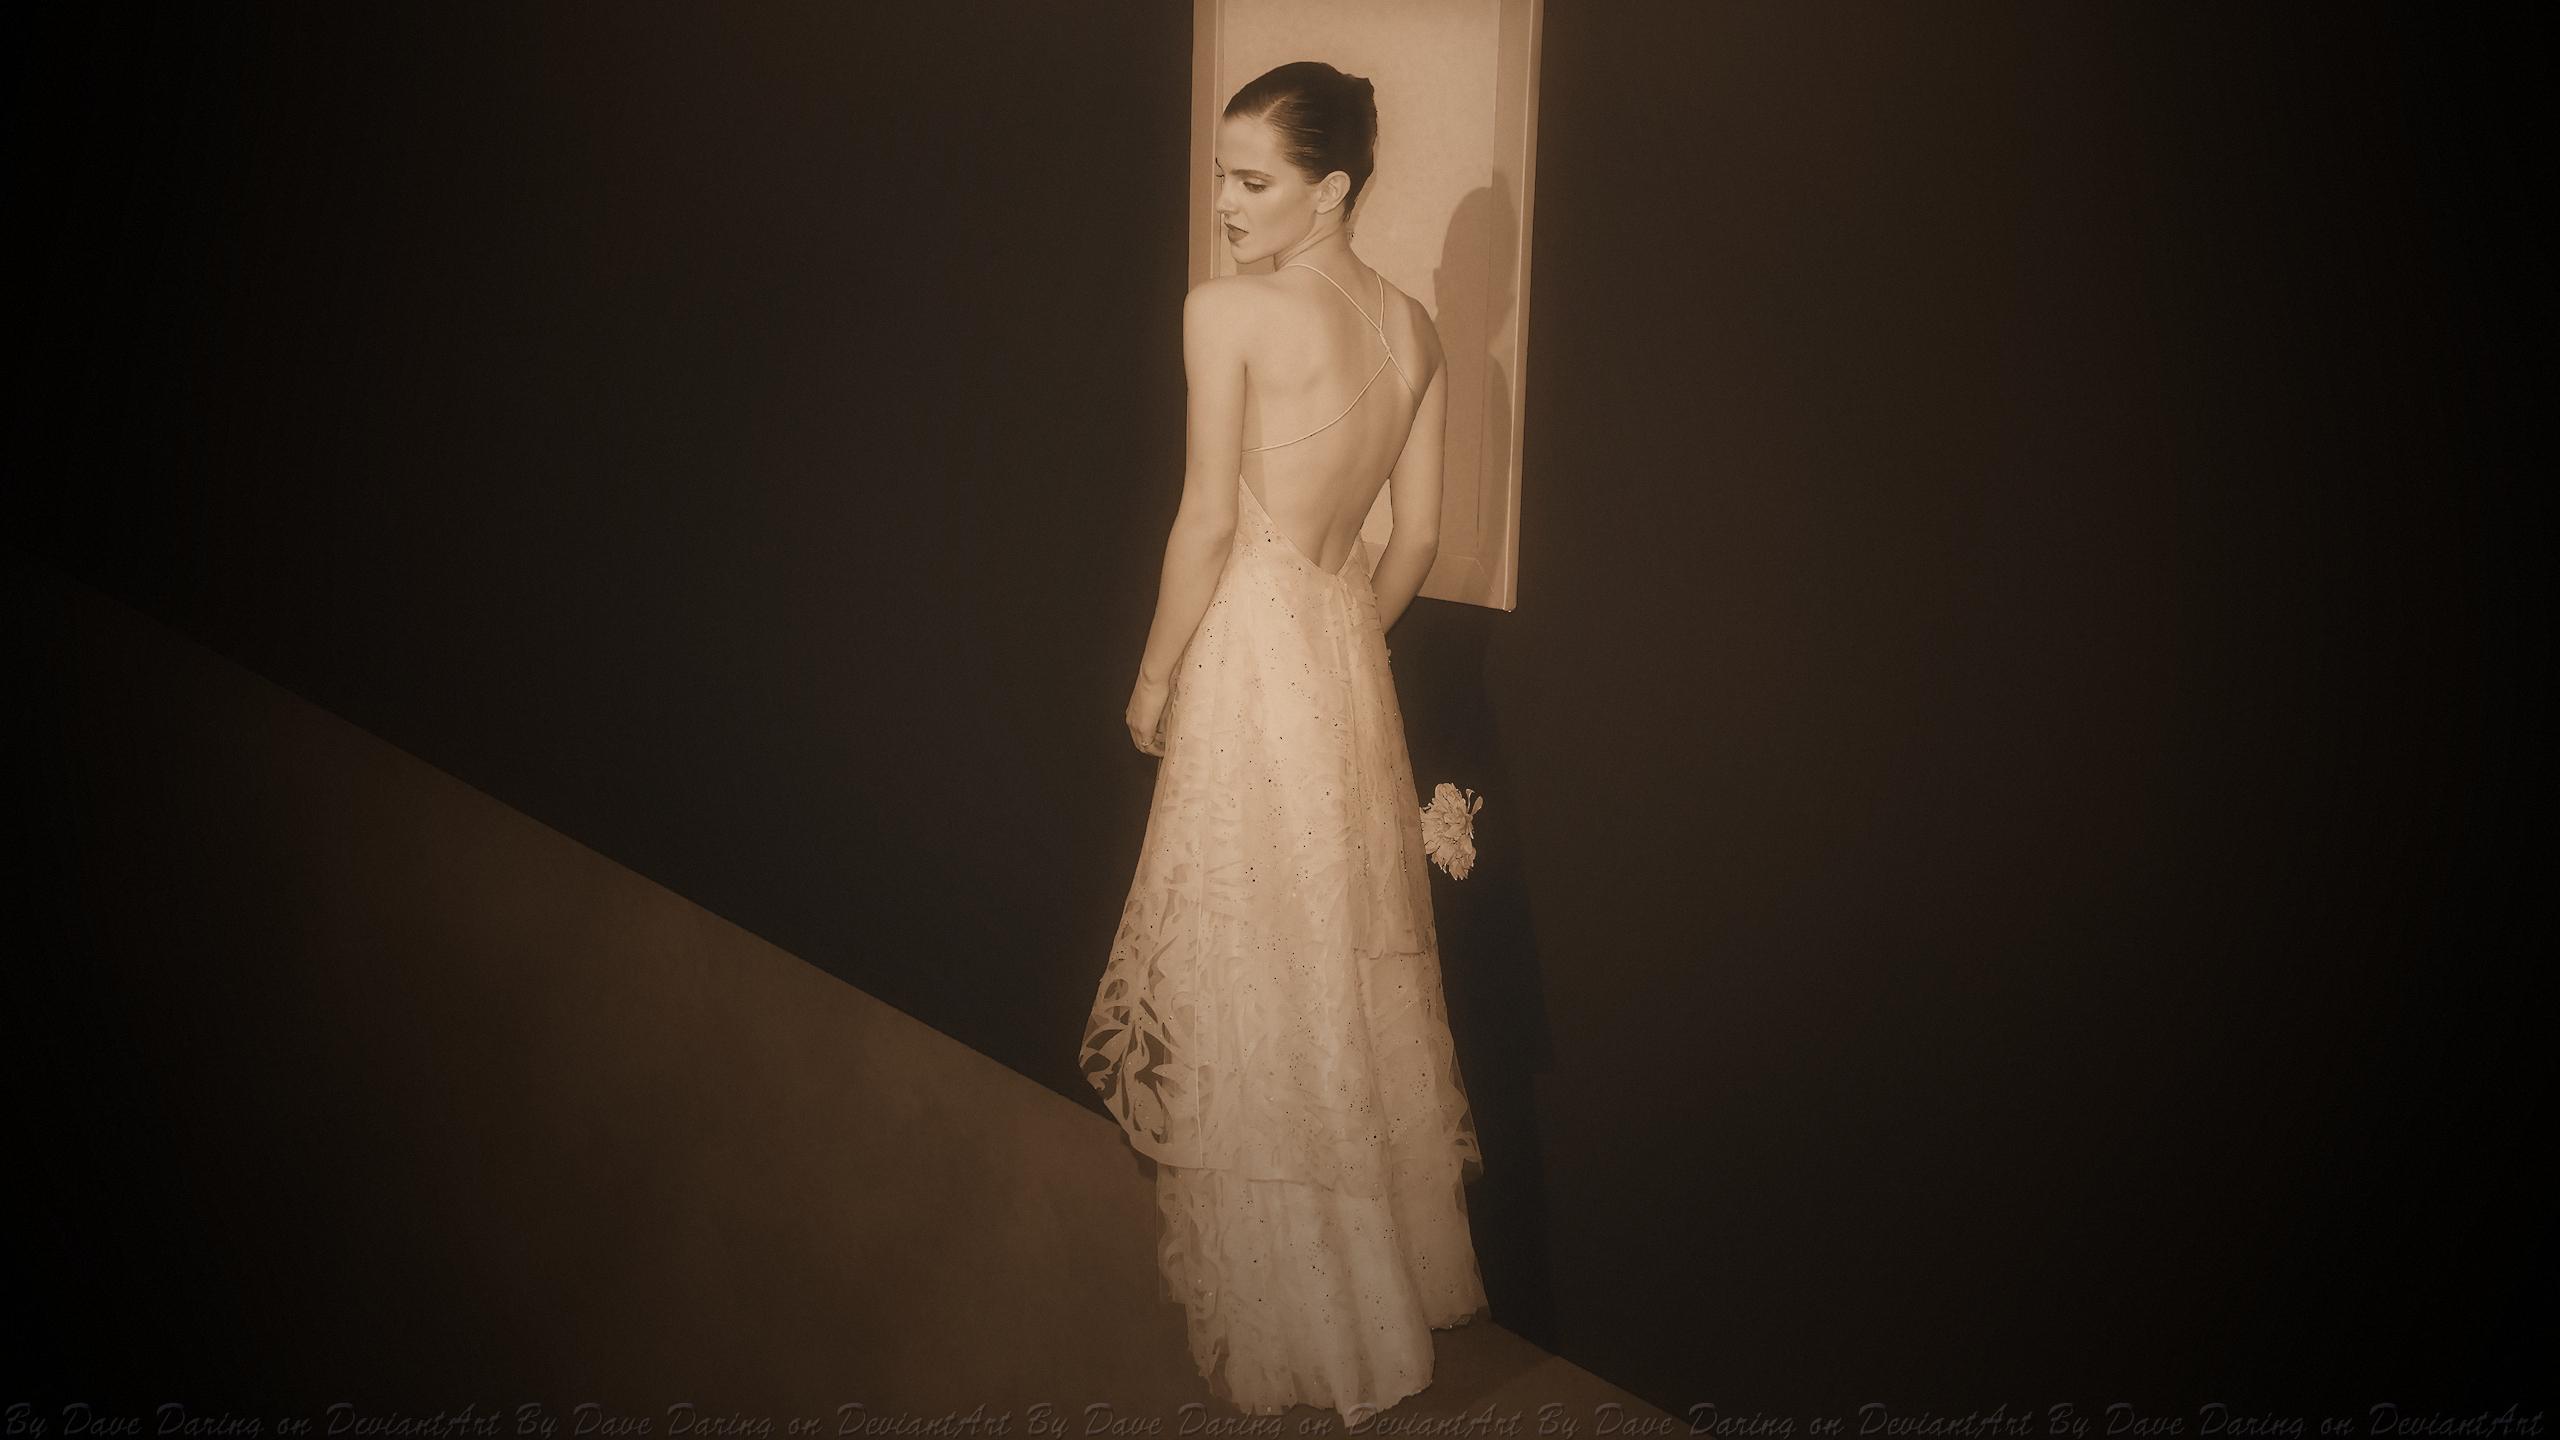 Emma Watson Vintage Wallflower by Dave-Daring